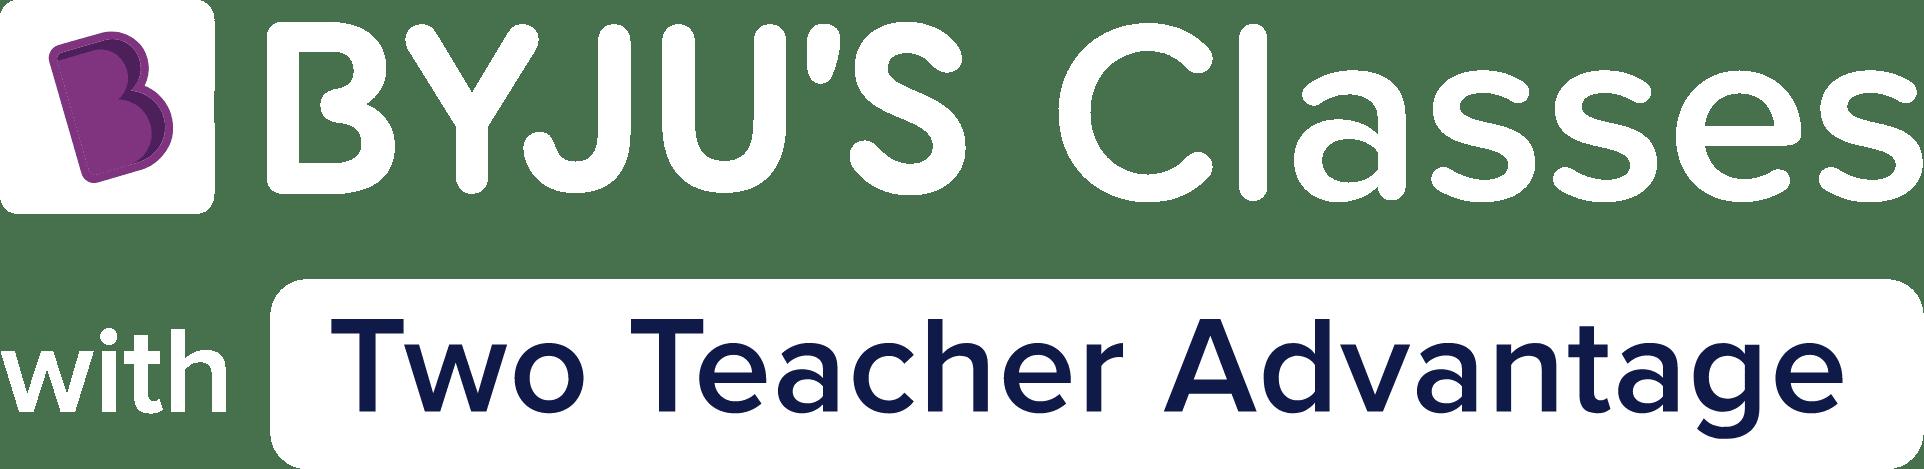 BYJU'S classes two teacher model